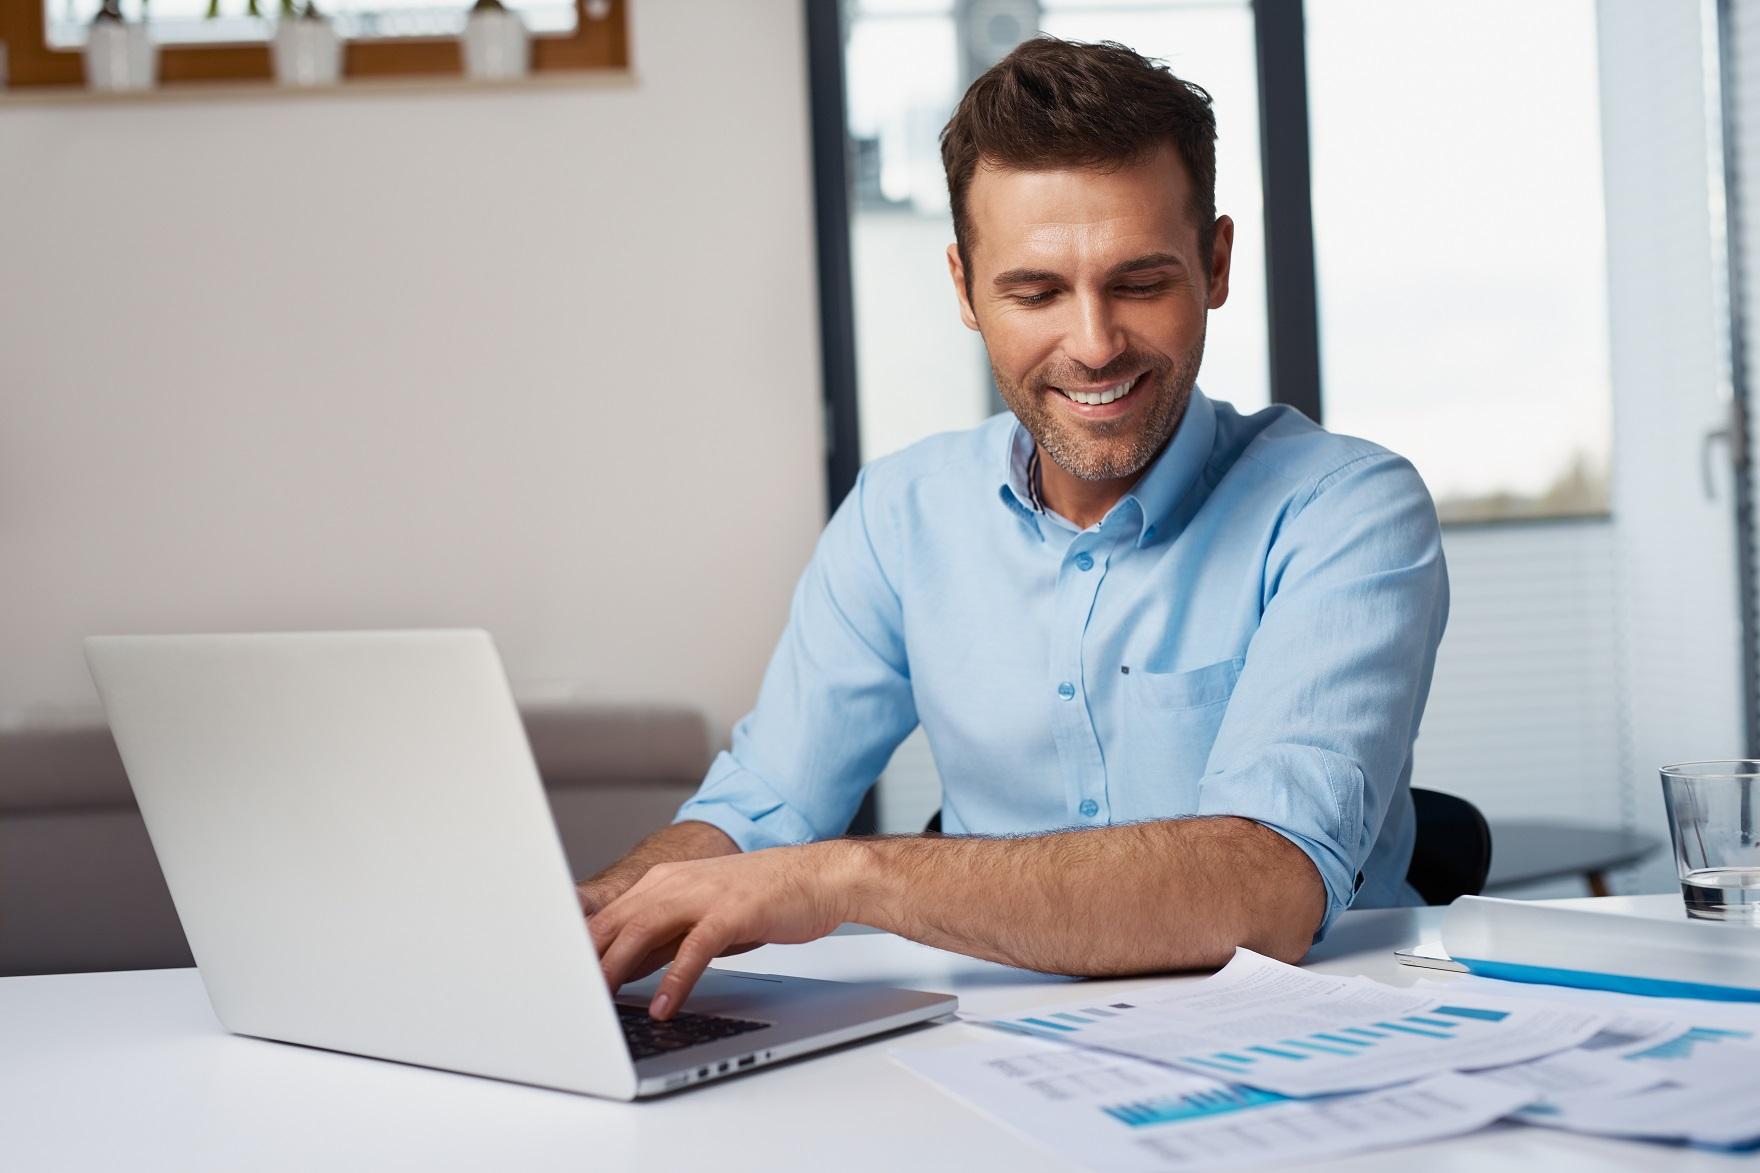 Man doing data entry job at laptop